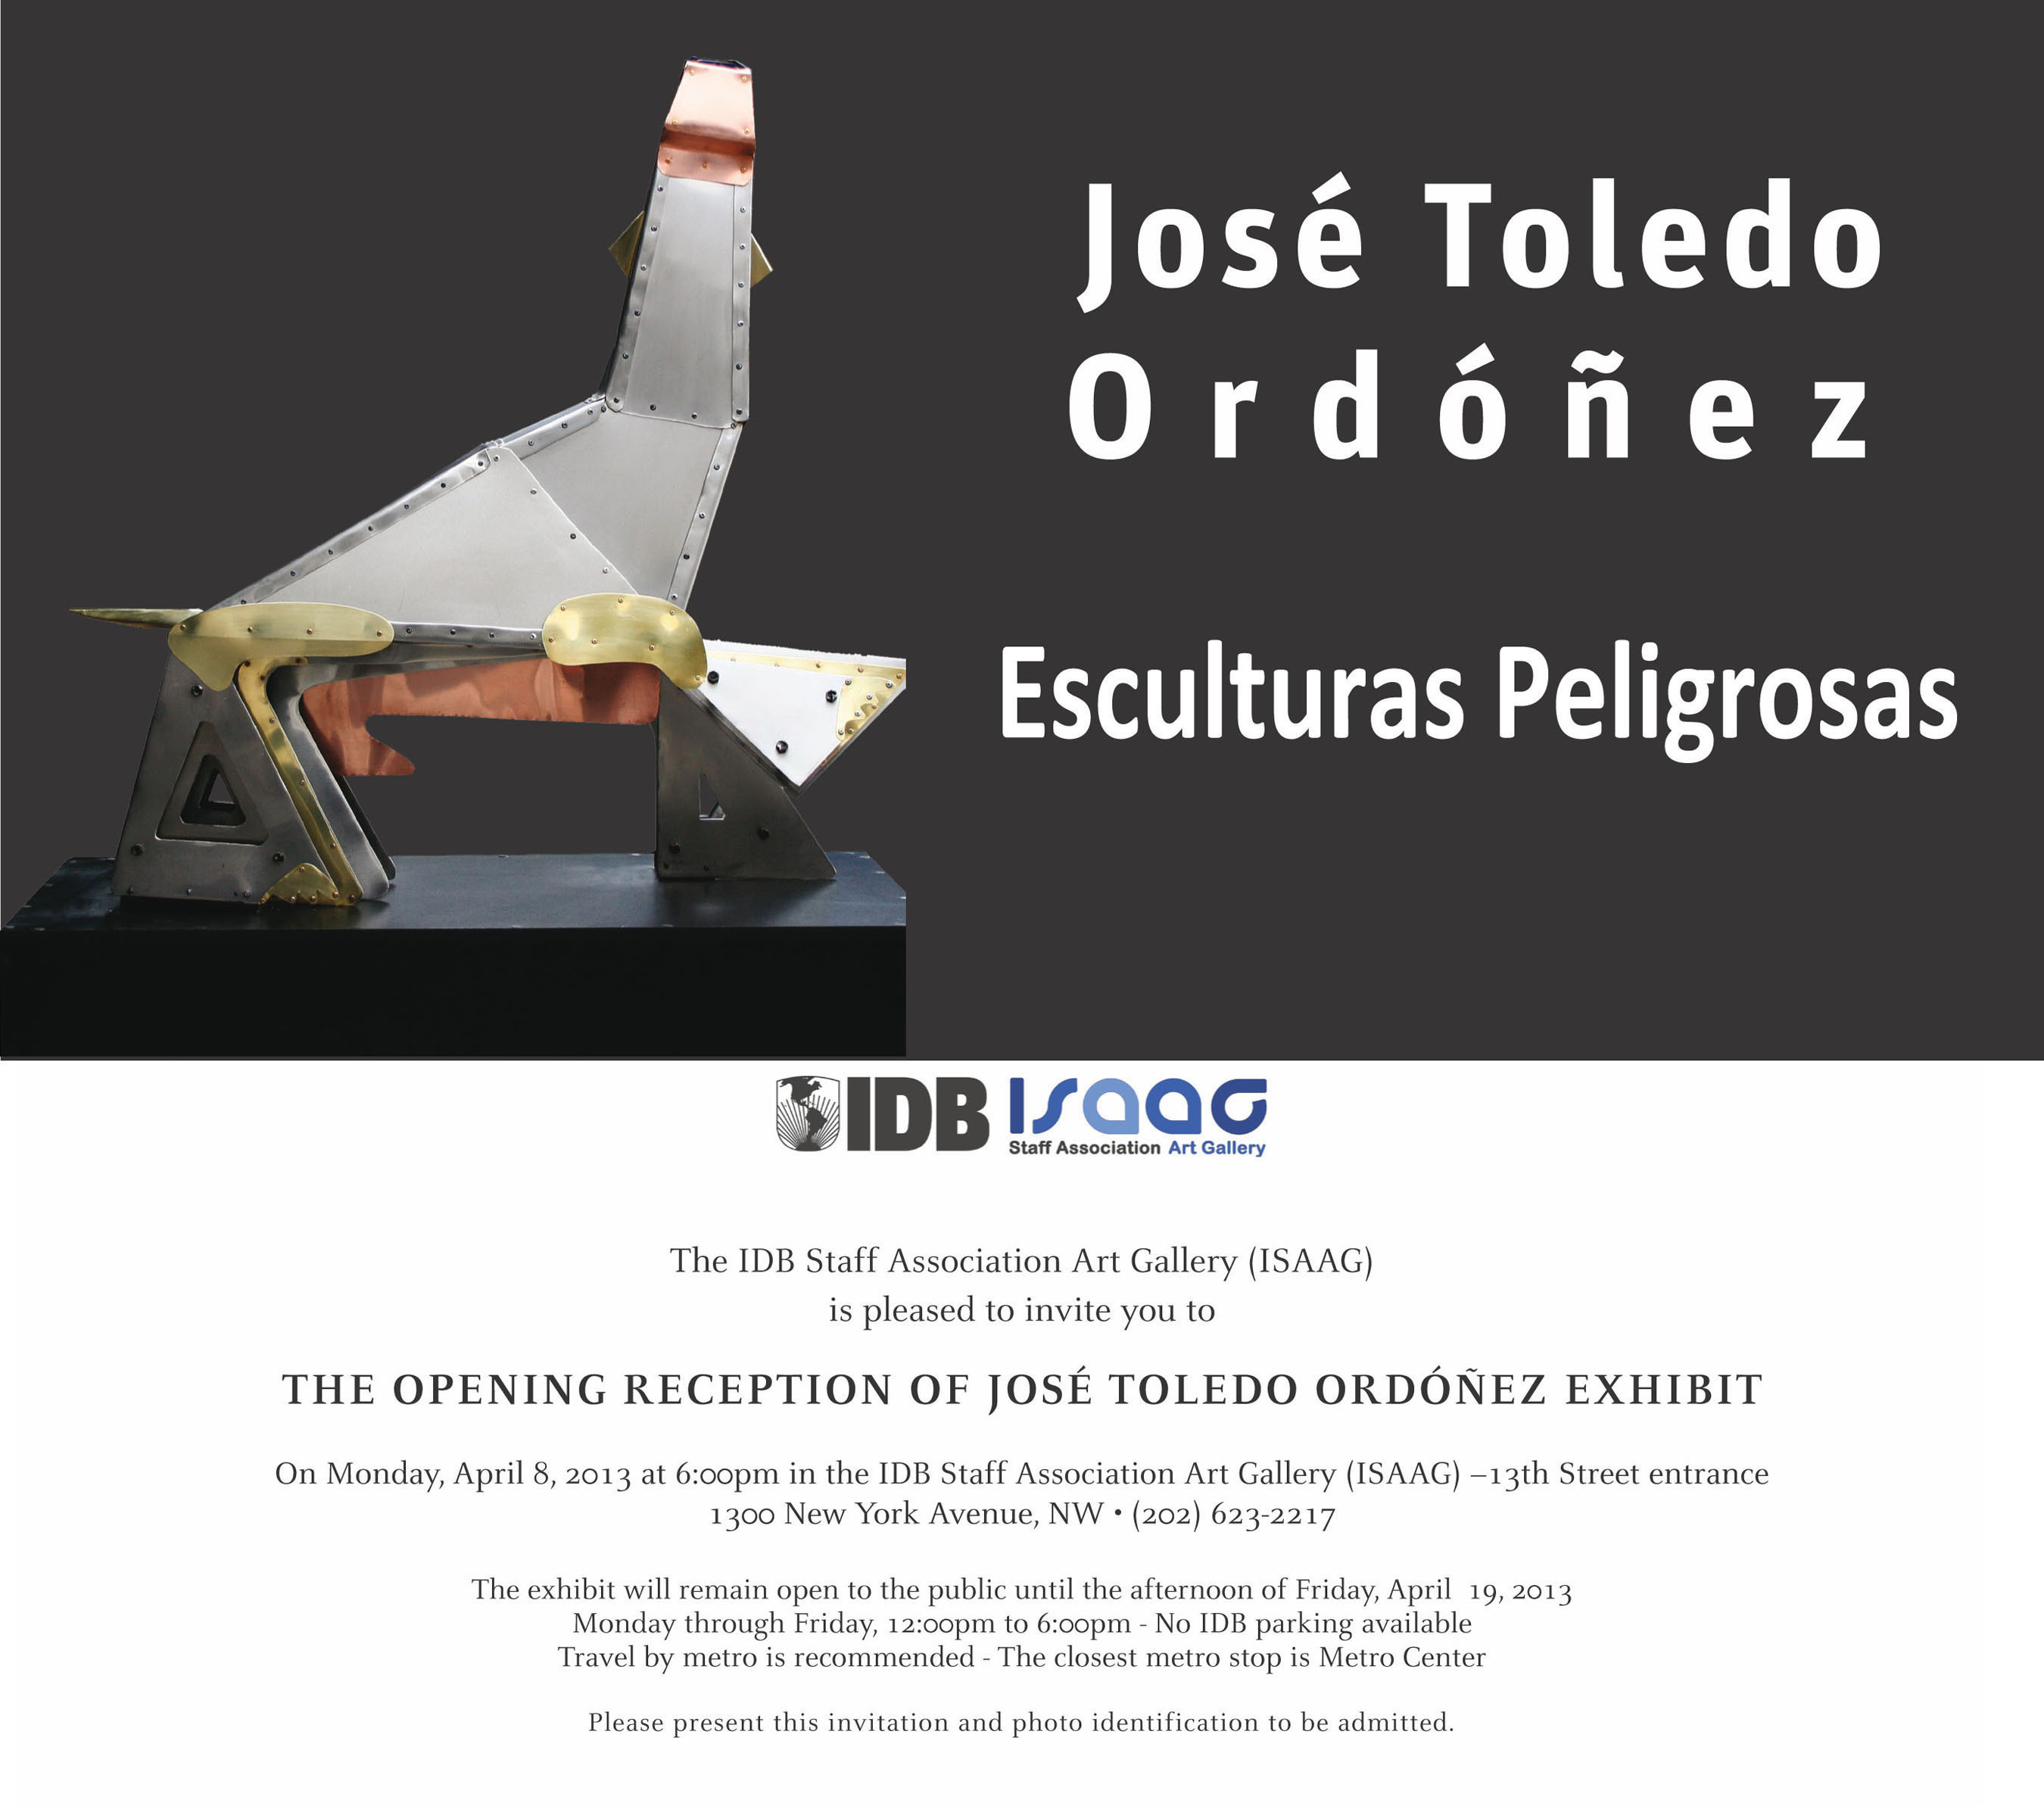 Esculturas Peligrosas (Dangerous Sculptures), Jose Toledo Ordonez, Guatemalan Sculptor, IDB Staff Association Art Galery de Washington DC, 1300 New York Avenue, N.W., Washington, DC, 20577. (PRNewsFoto/Jose Toledo Ordonez) (PRNewsFoto/JOSE TOLEDO ORDONEZ)